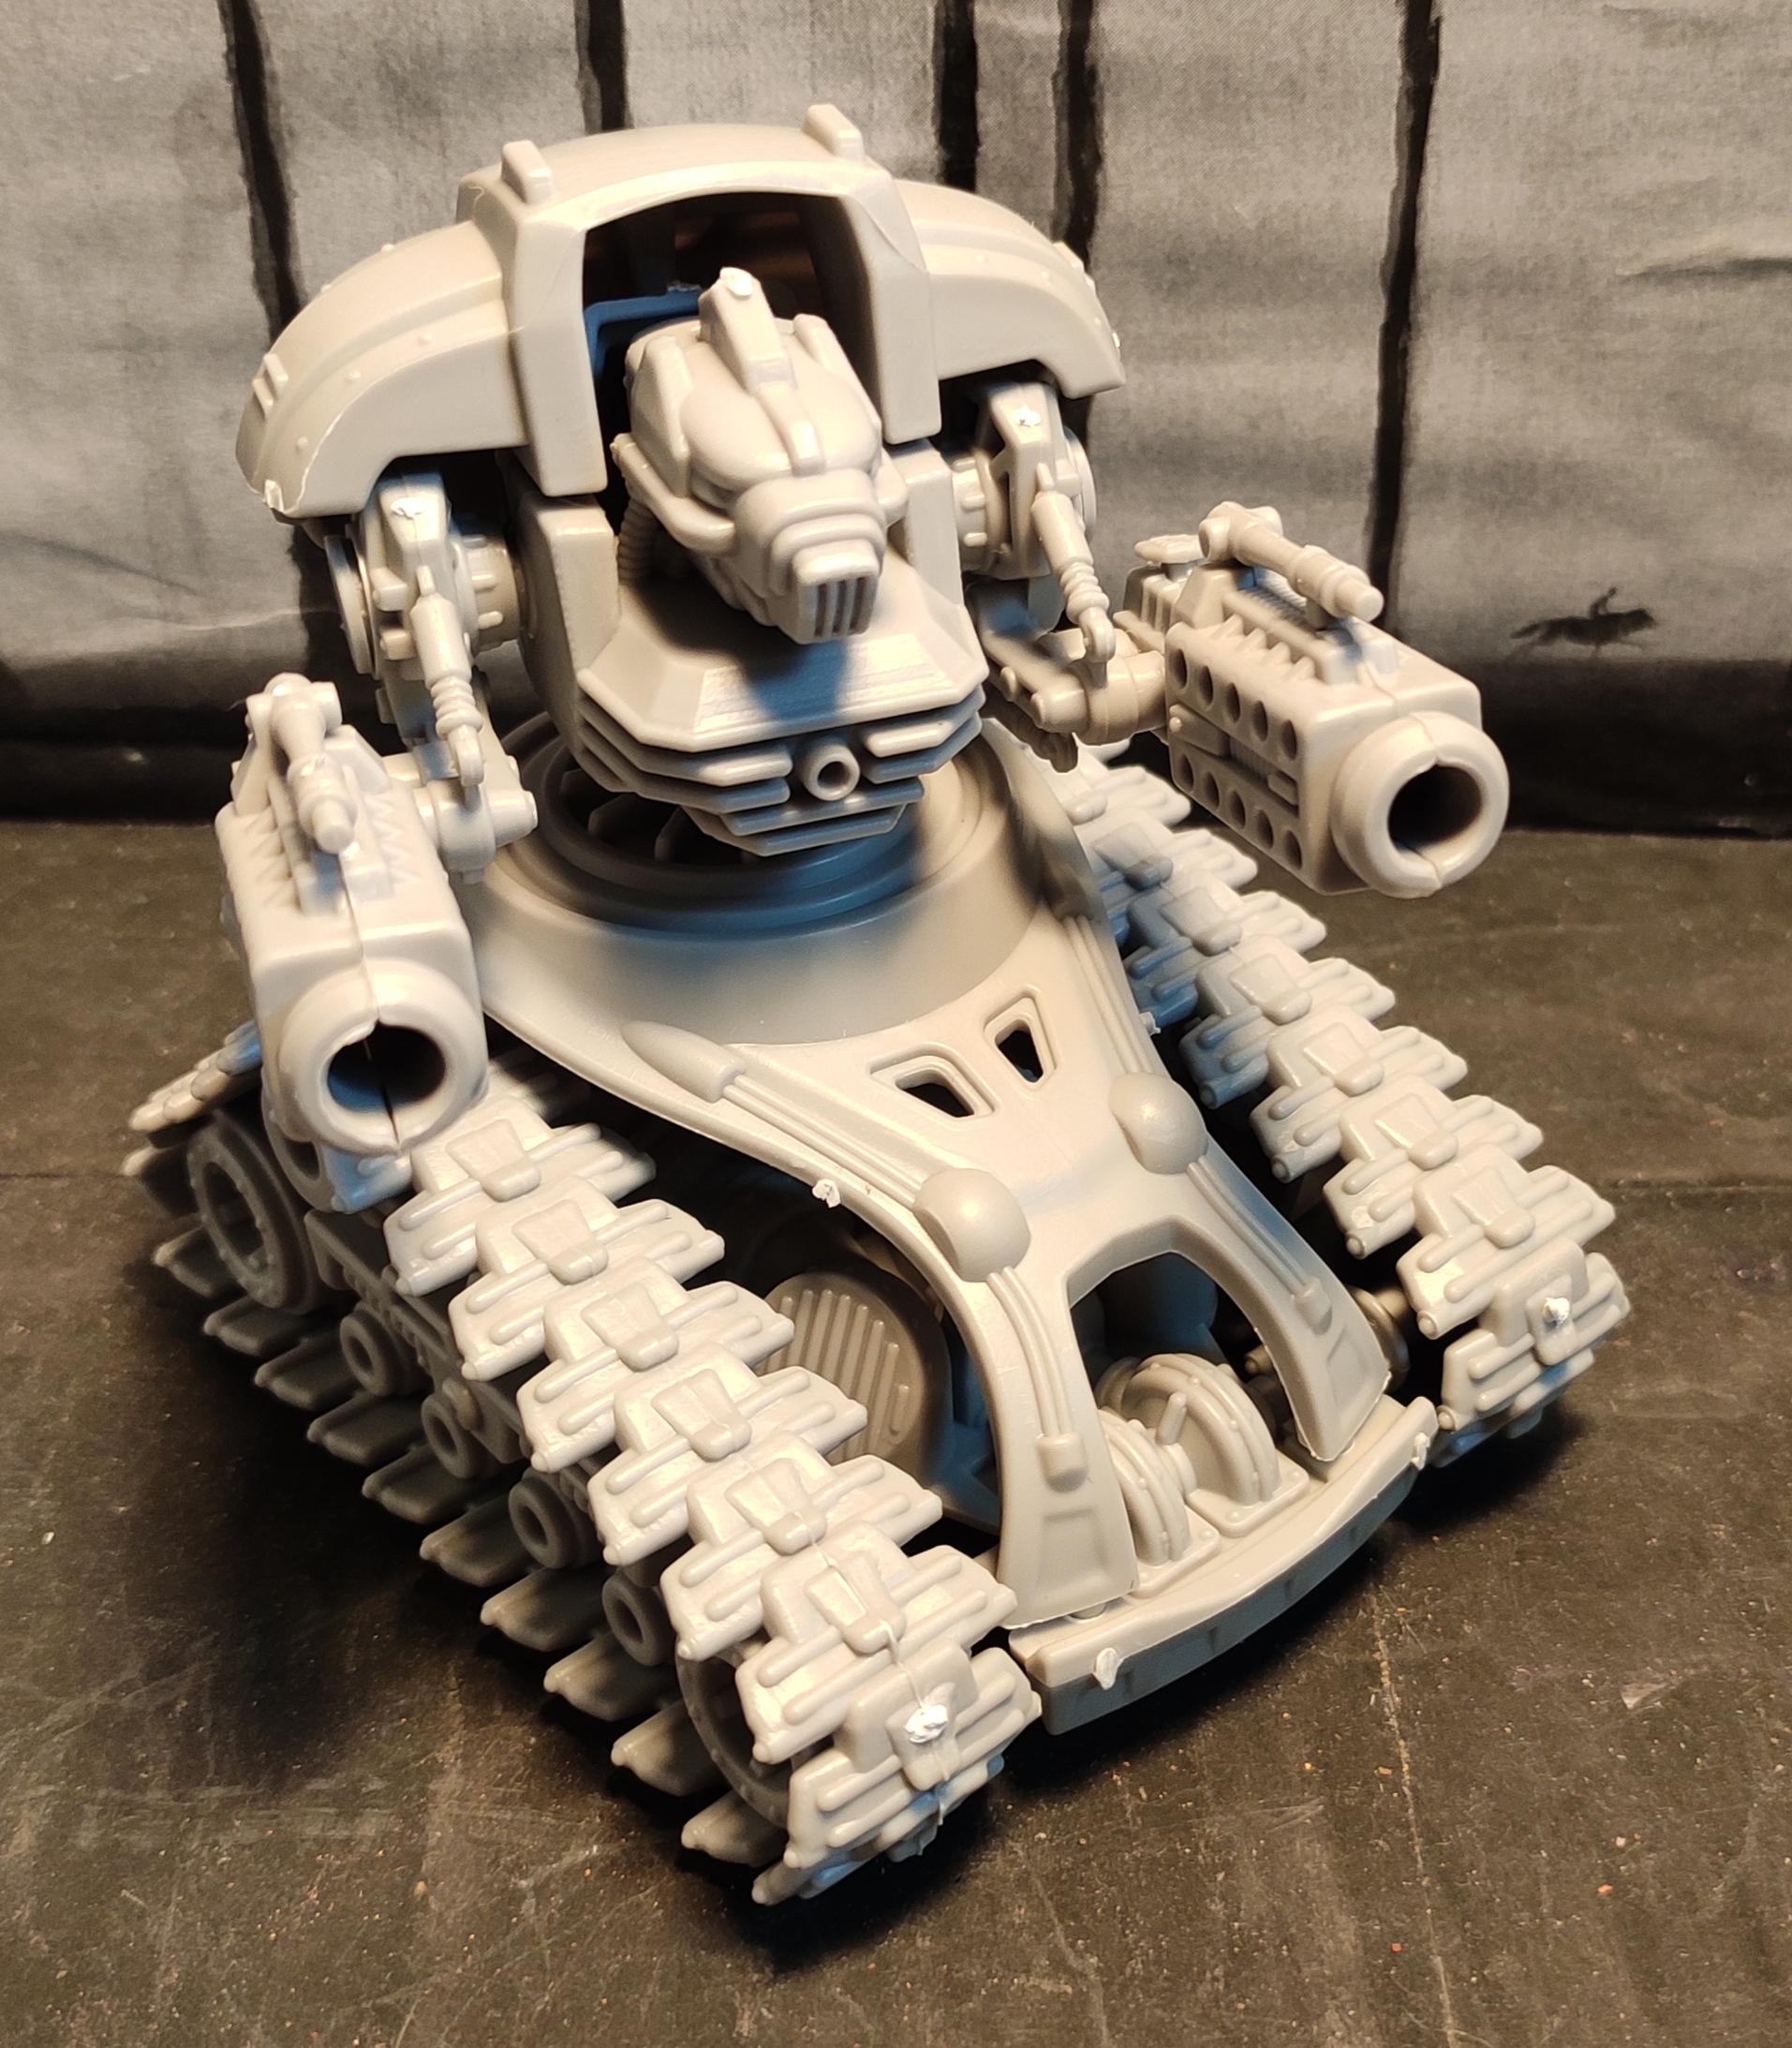 Armored Vehicle, Cyberon Planet, Cybertank, Robot, Tank, Technolog, Tehnolog, Work In Progress